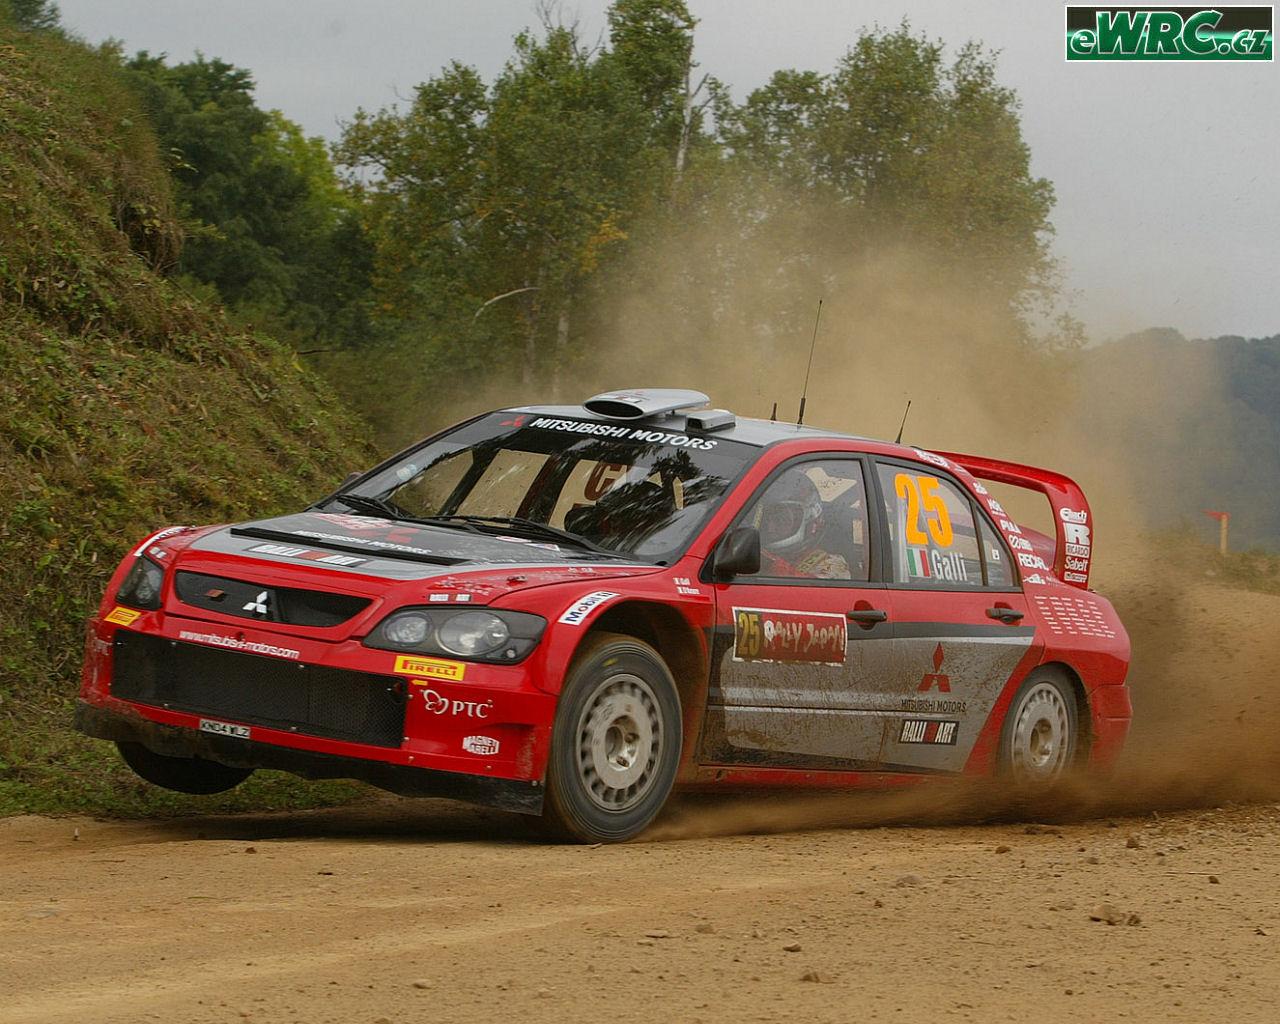 World Rally Championship: Temporada 2019 - Página 17 Ot_w_7_galli_1